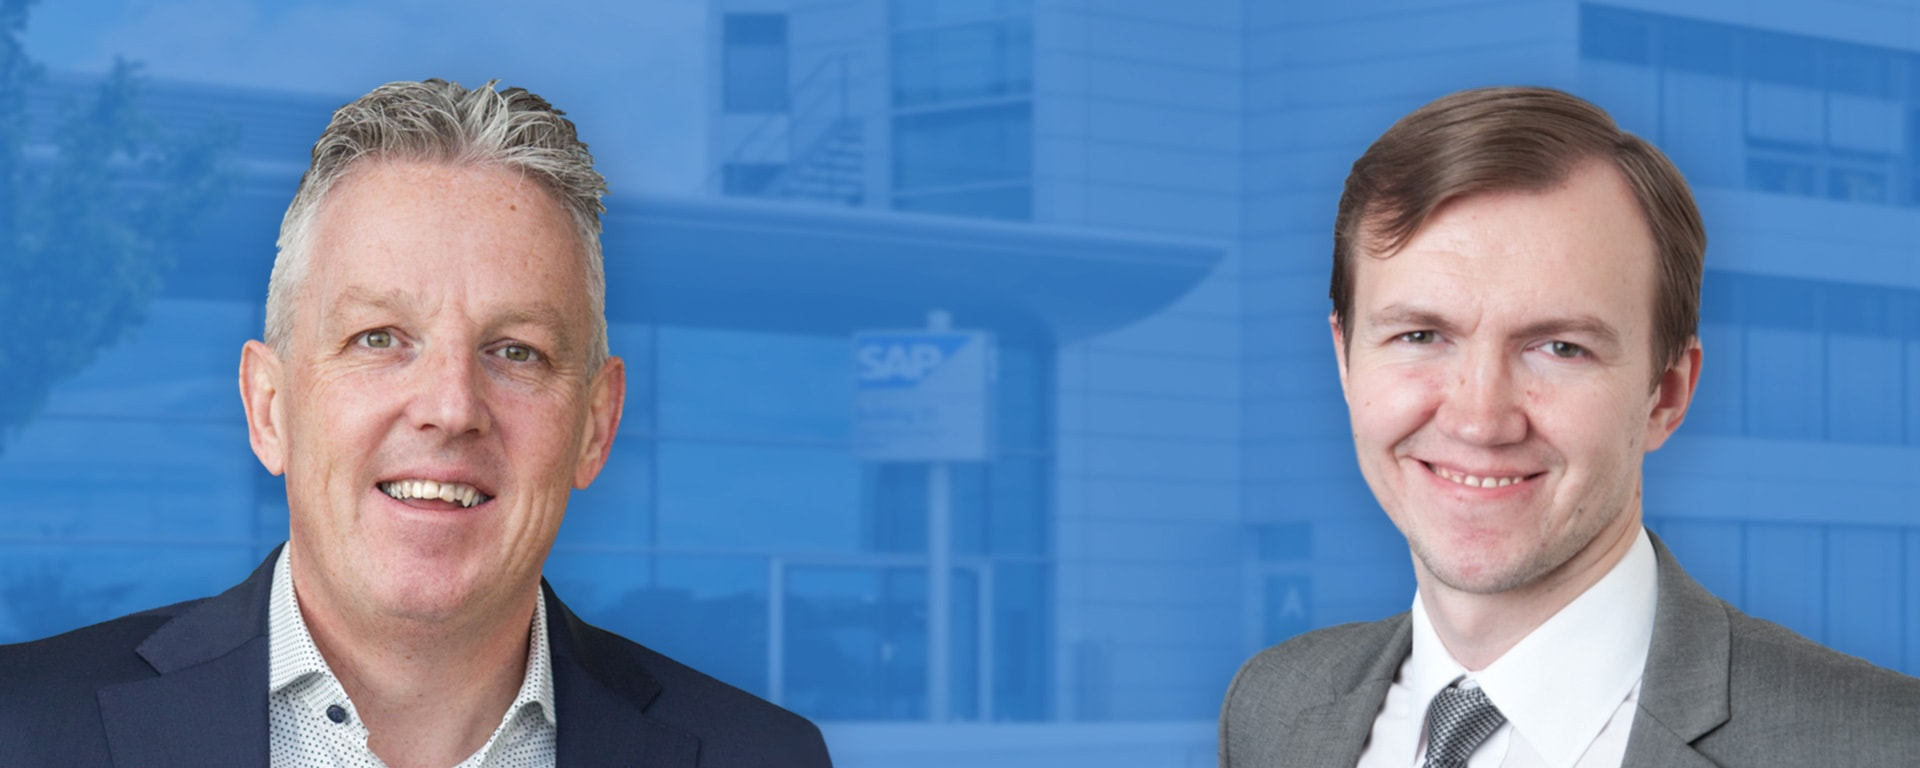 When Process Management Meets Human Resources - SAP interview Partners